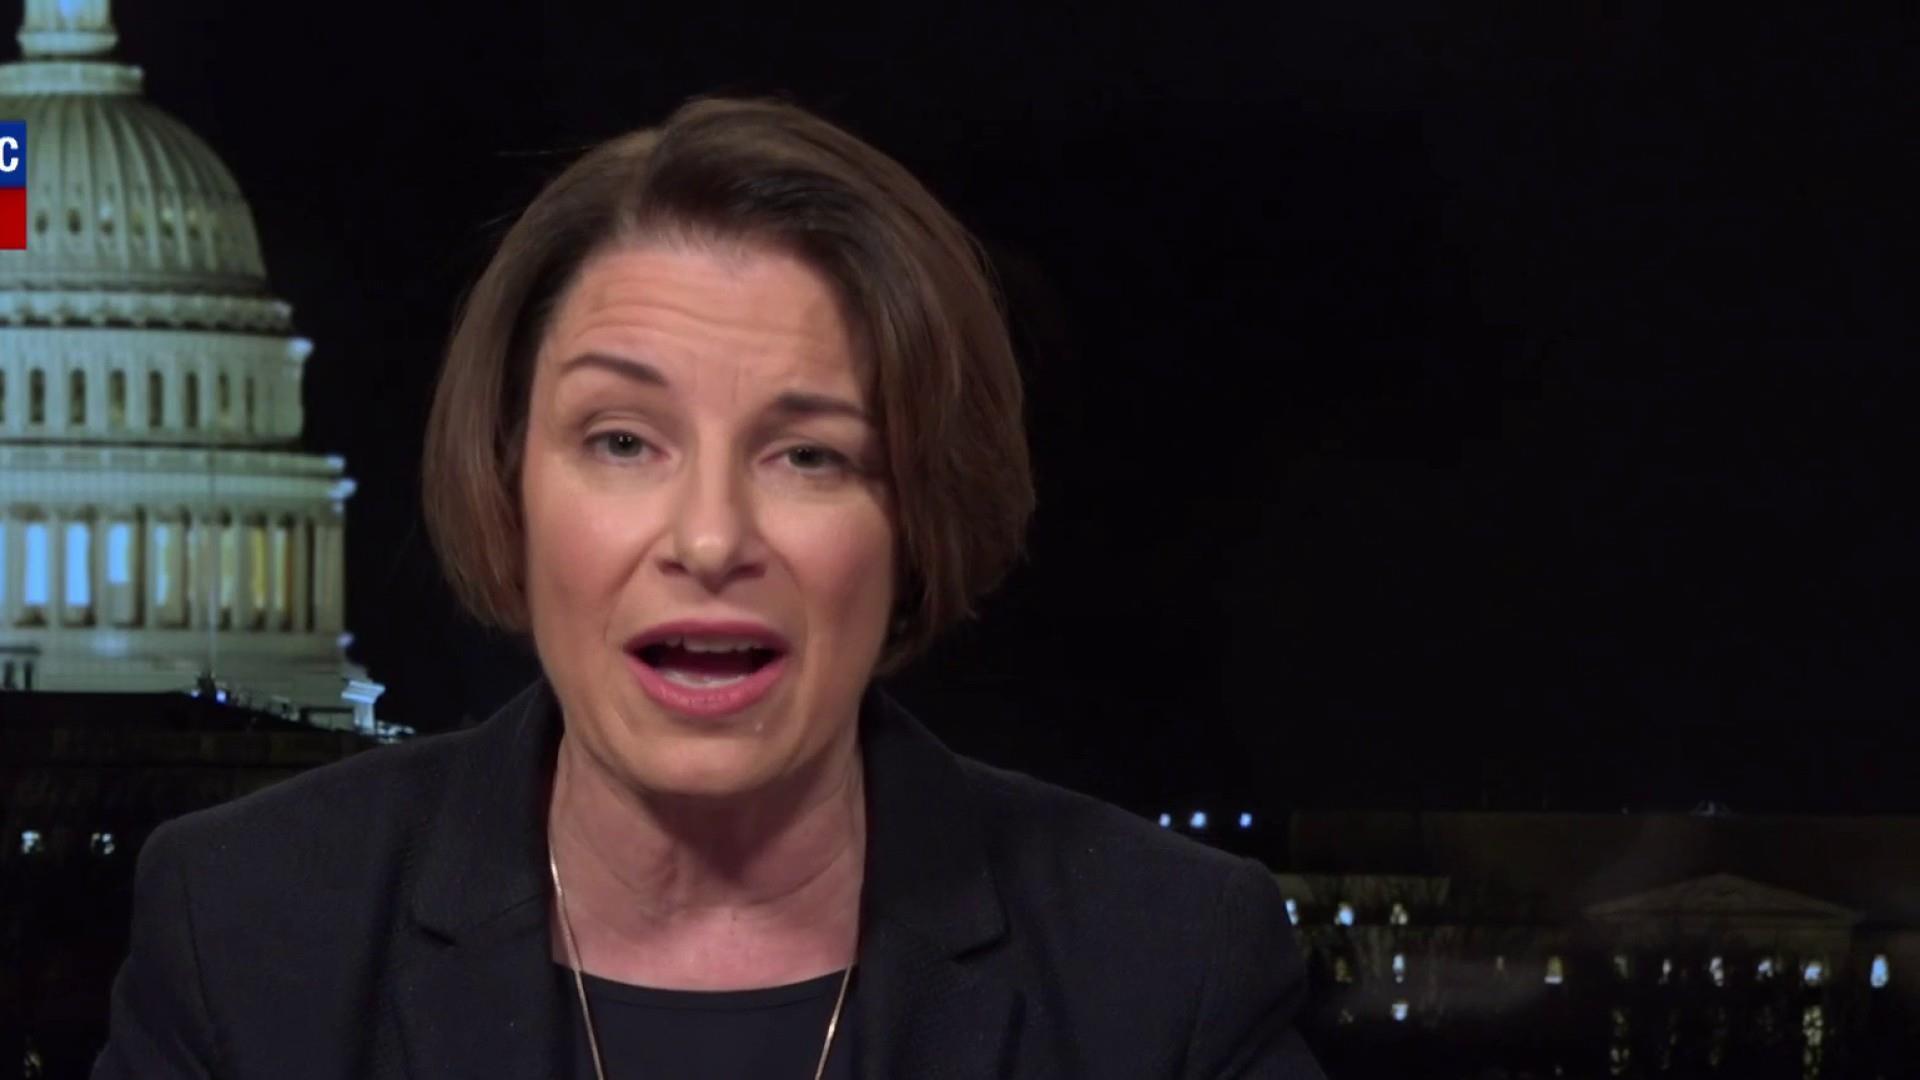 Sen. Amy Klobuchar supports a public option, tackling prescription drug prices